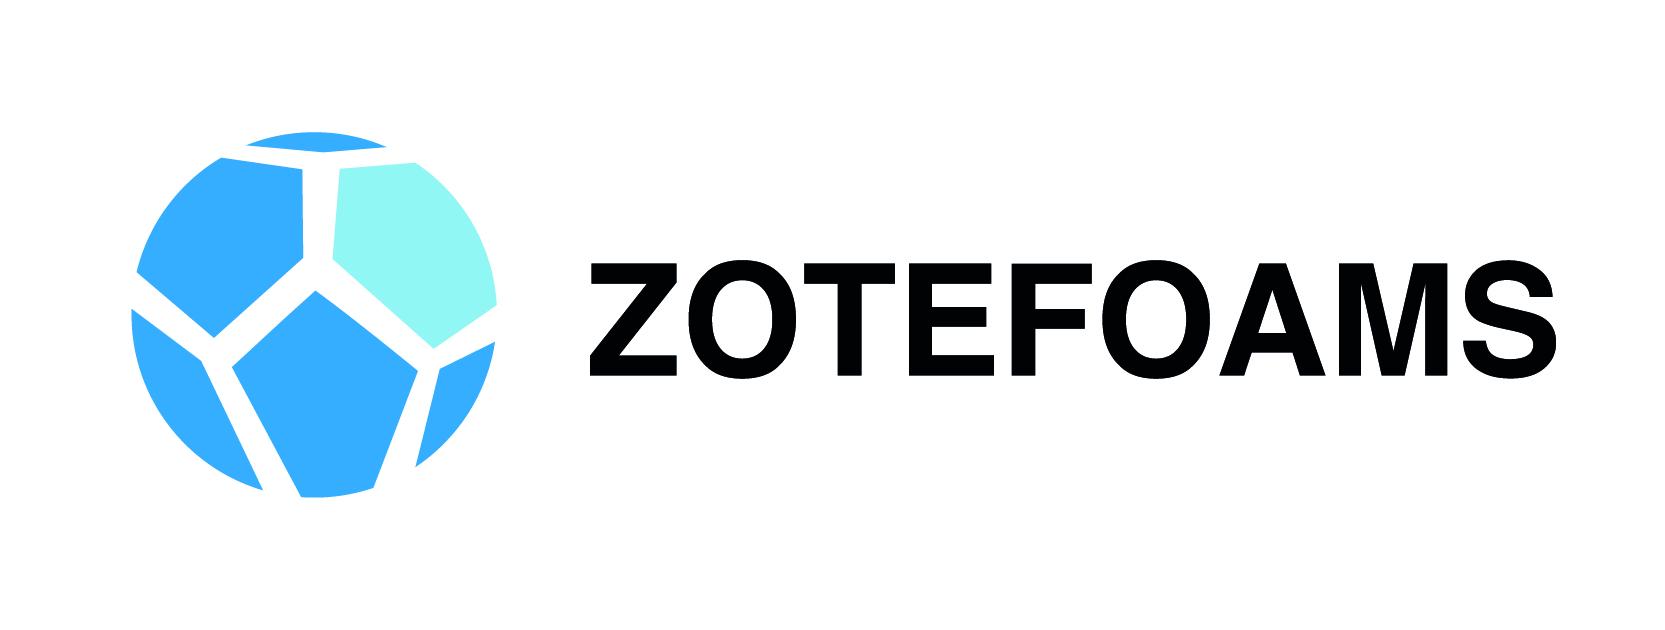 Halex Consulting Zotefoams logo